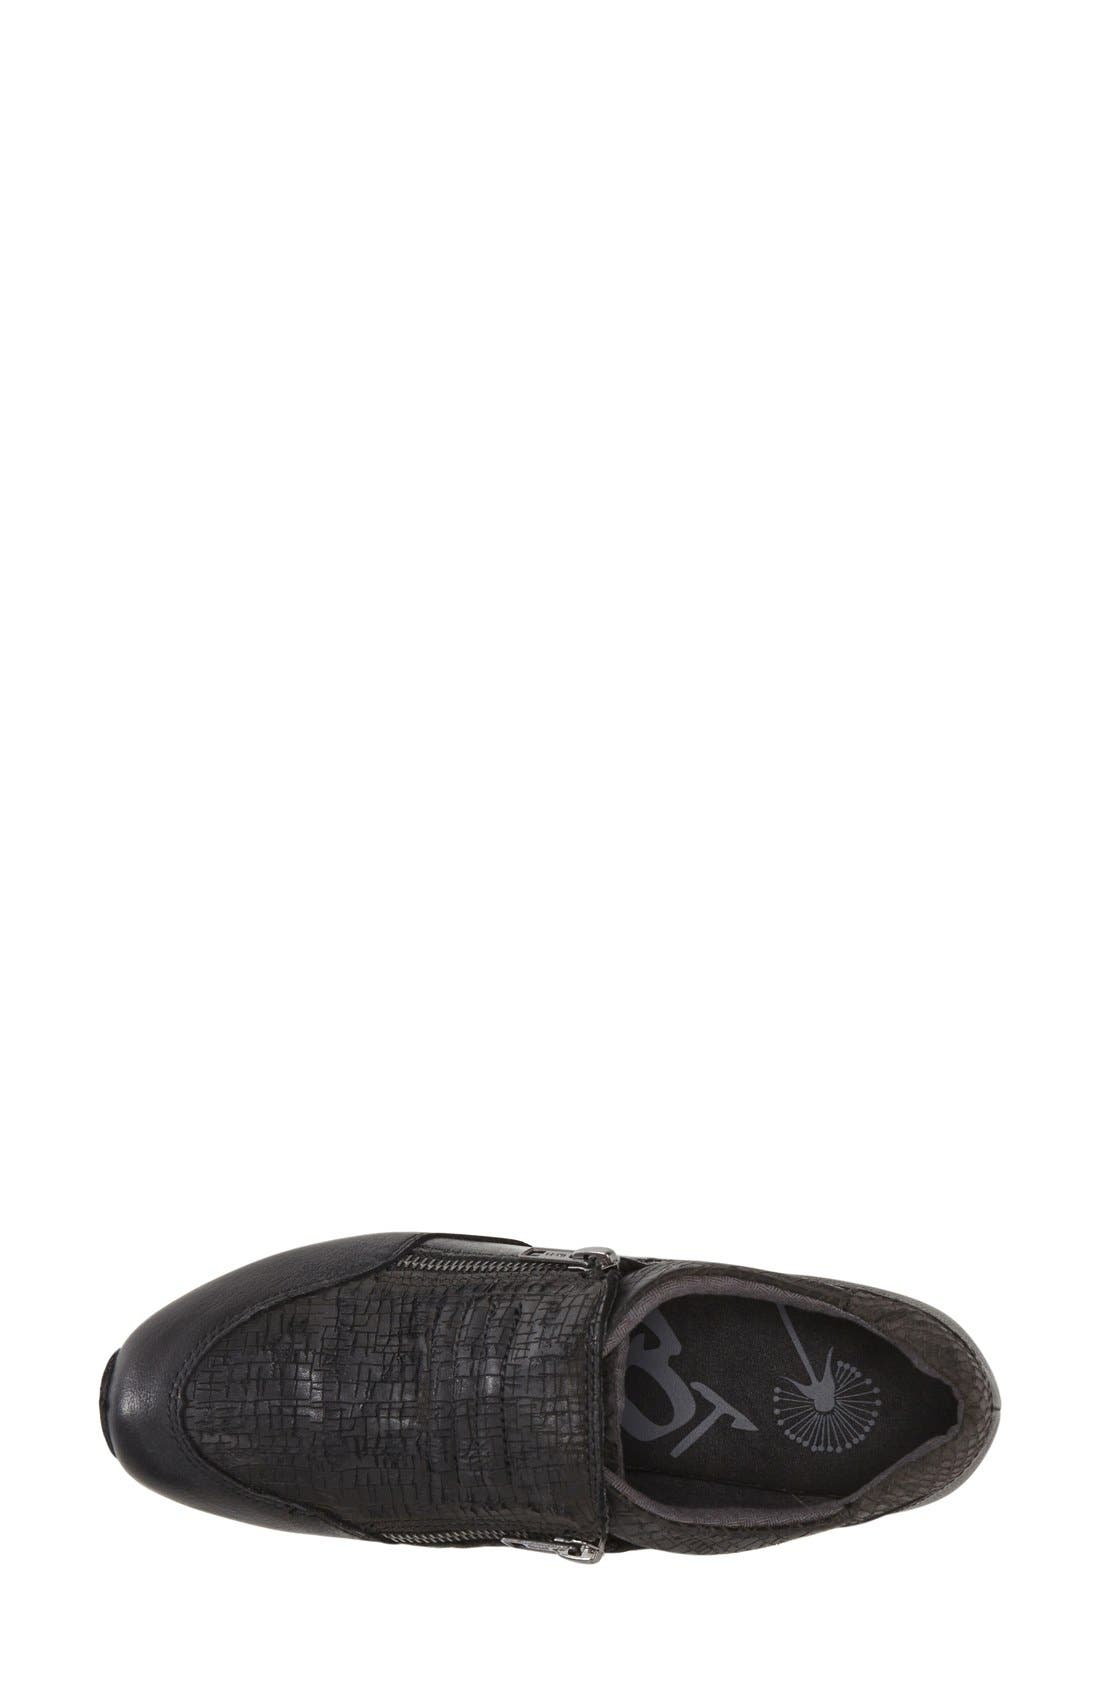 'Sewell' Sneaker,                             Alternate thumbnail 3, color,                             001